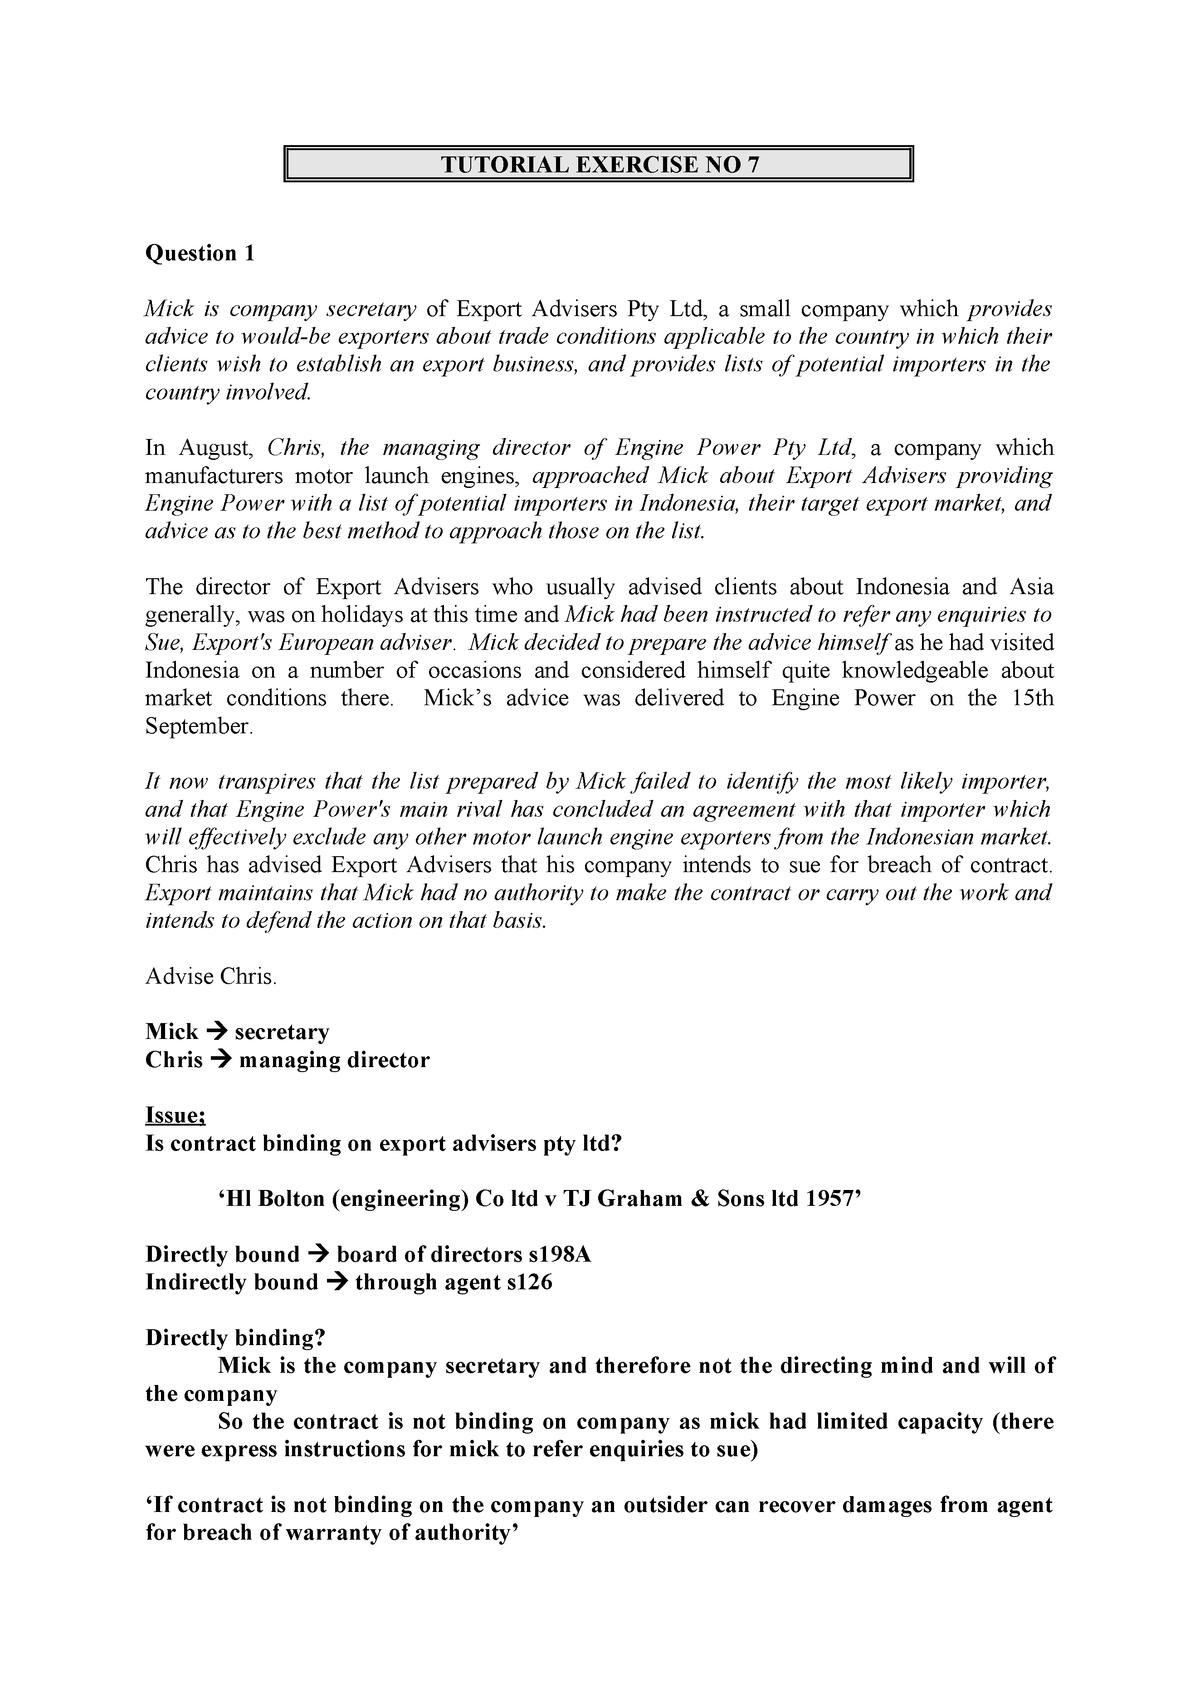 Tute Ex 7 - tutorial 7 - LAWS2301 : Company Law - StuDocu